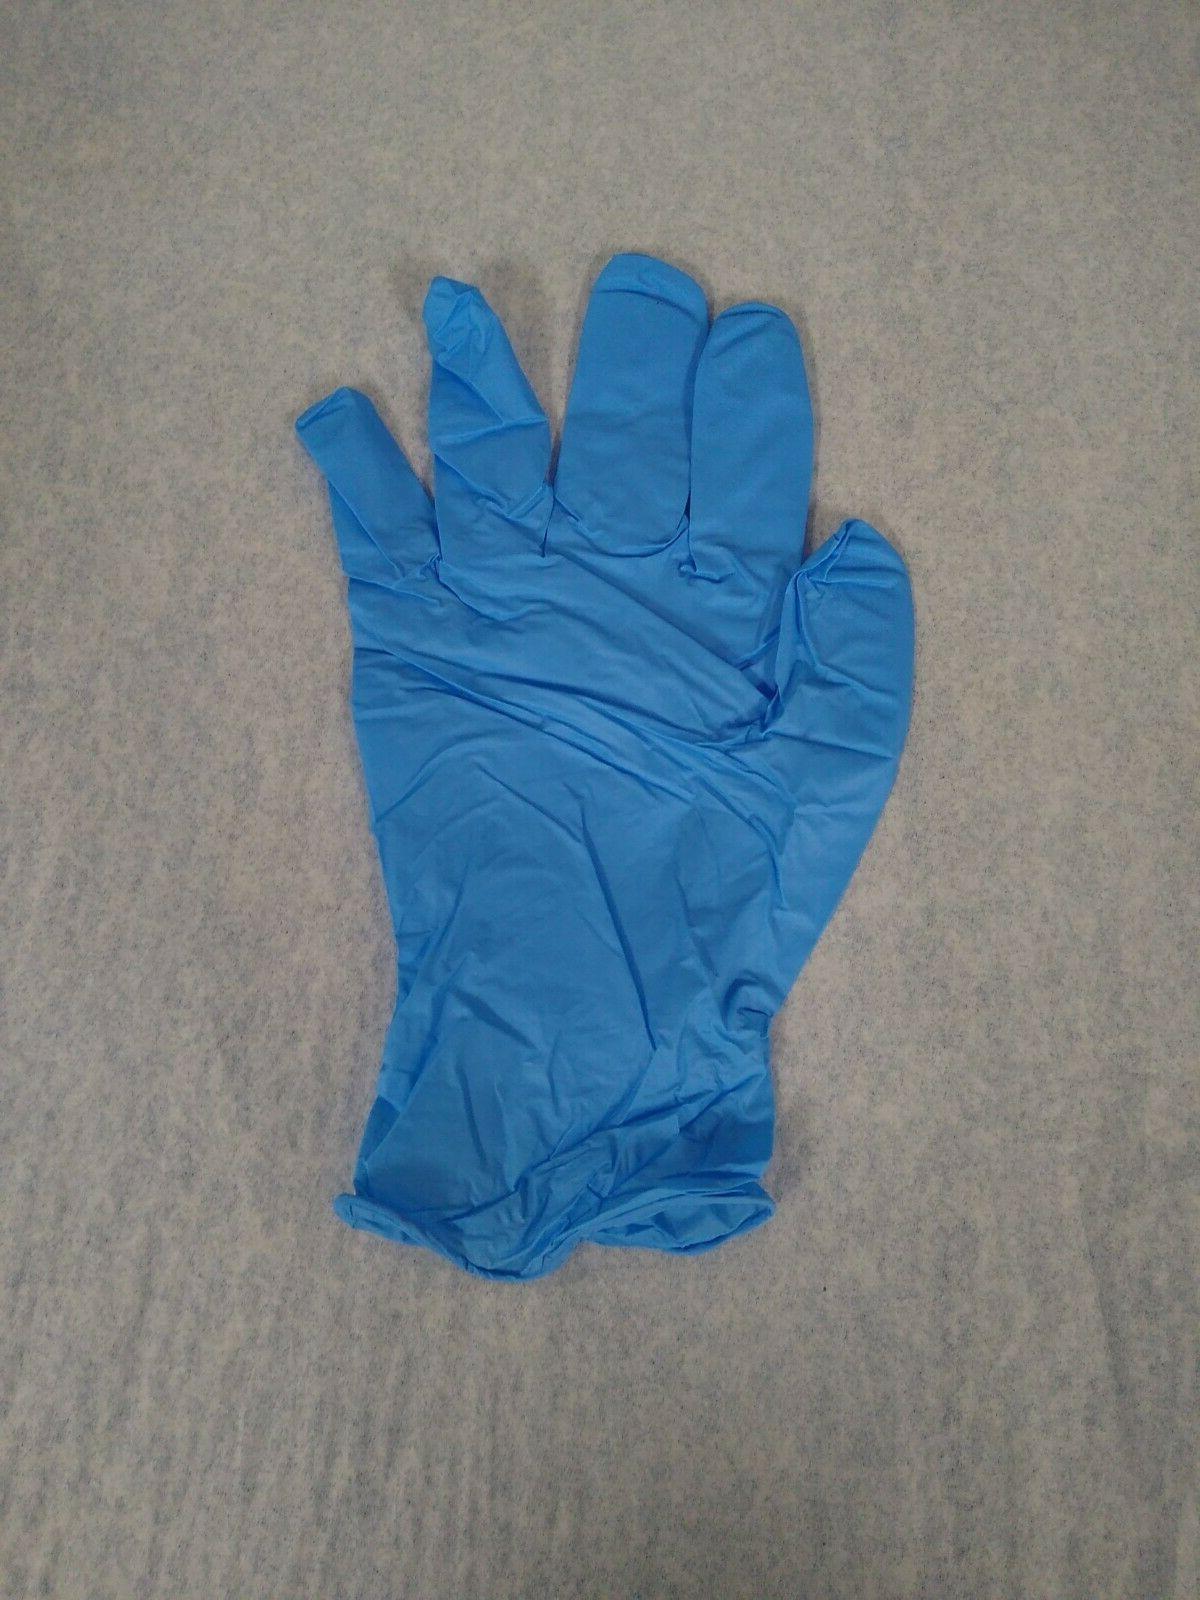 McKesson Nitrile Gloves, of